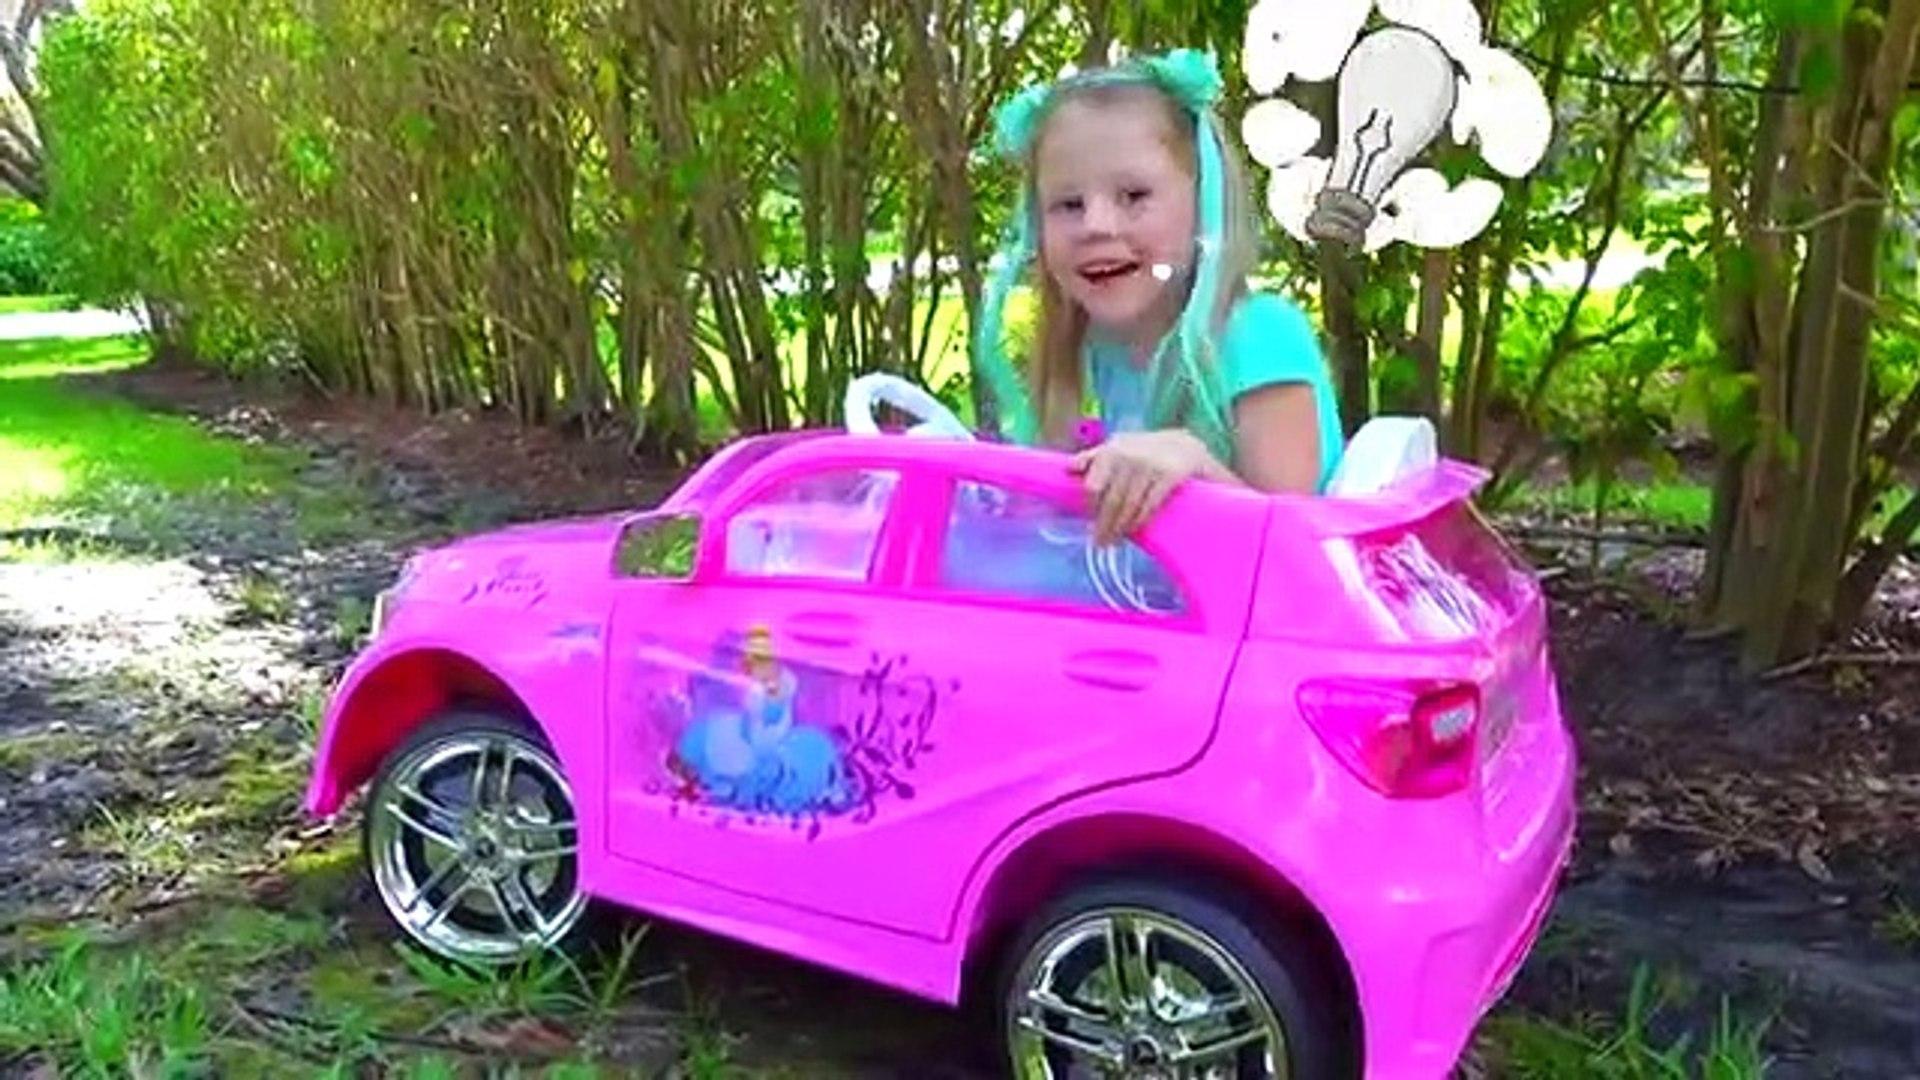 Настя и папа играют в мойку машин. Nasty playing Car Wash with Cleaning Toys